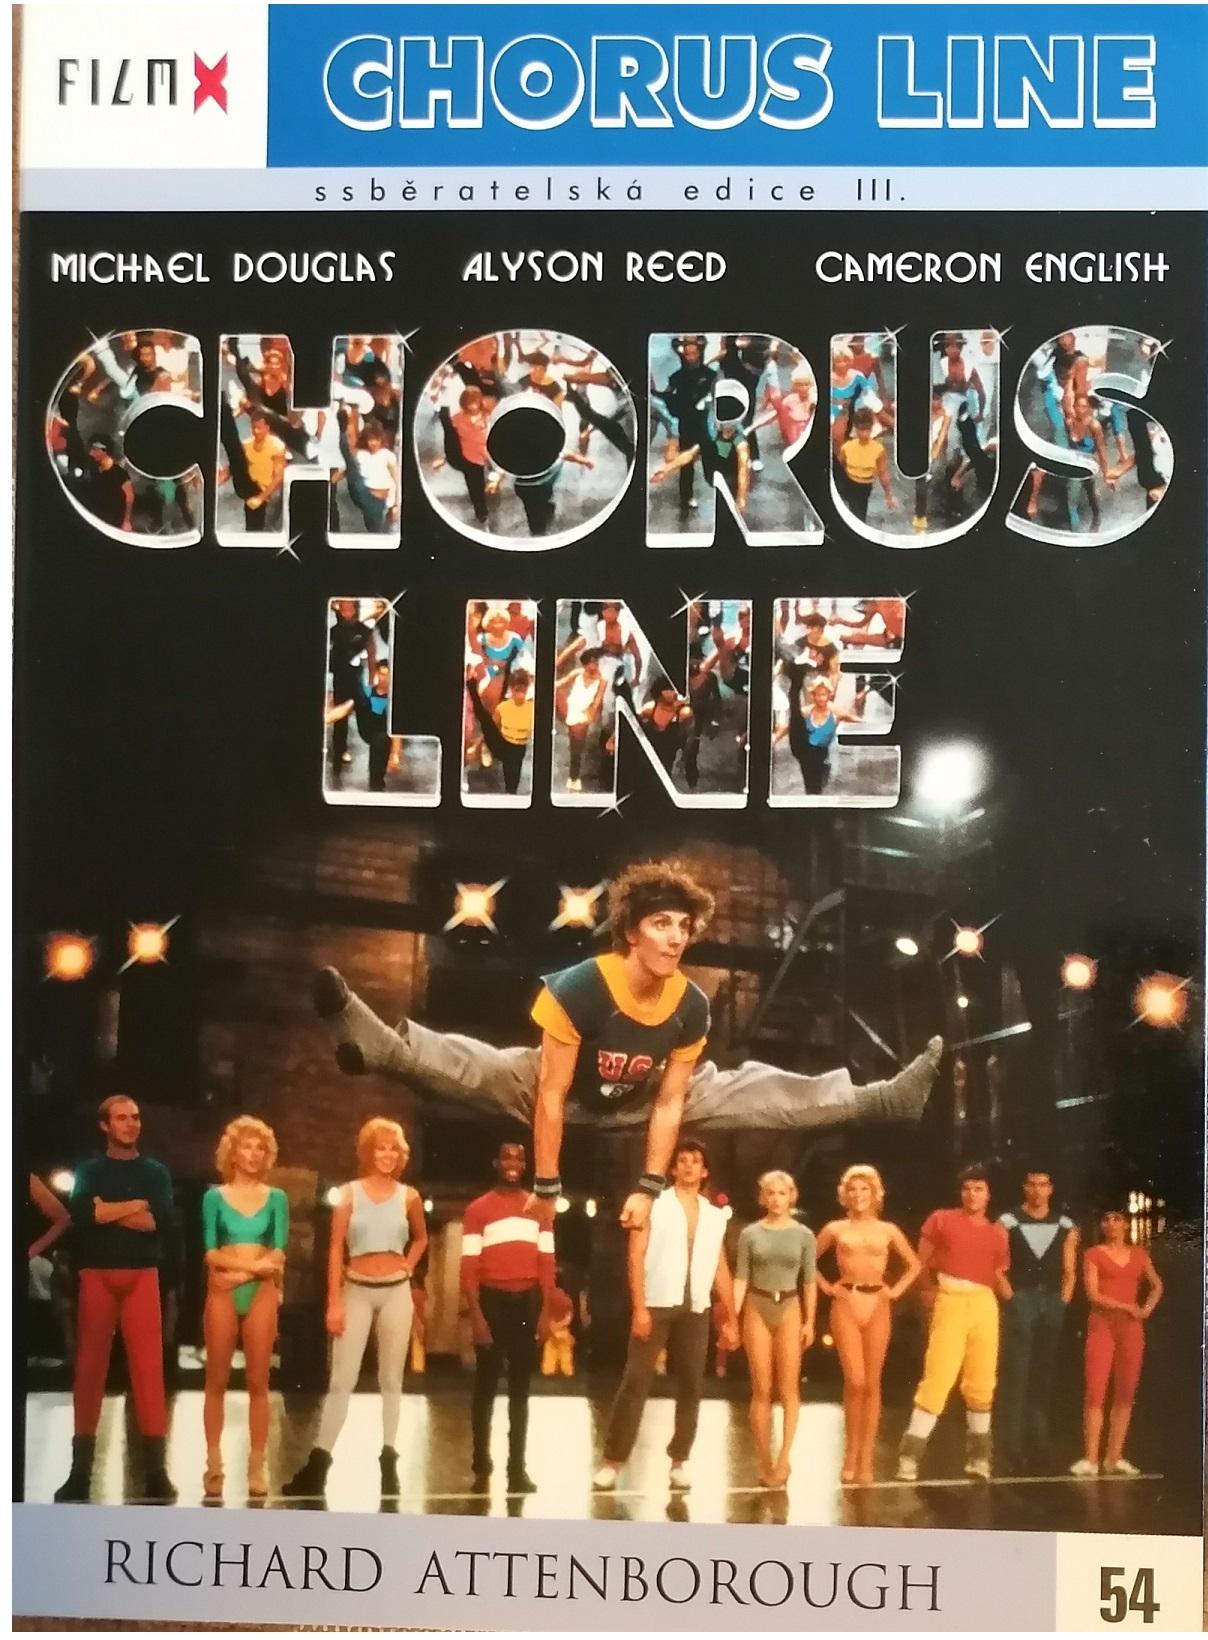 Chorus line - DVD digipack